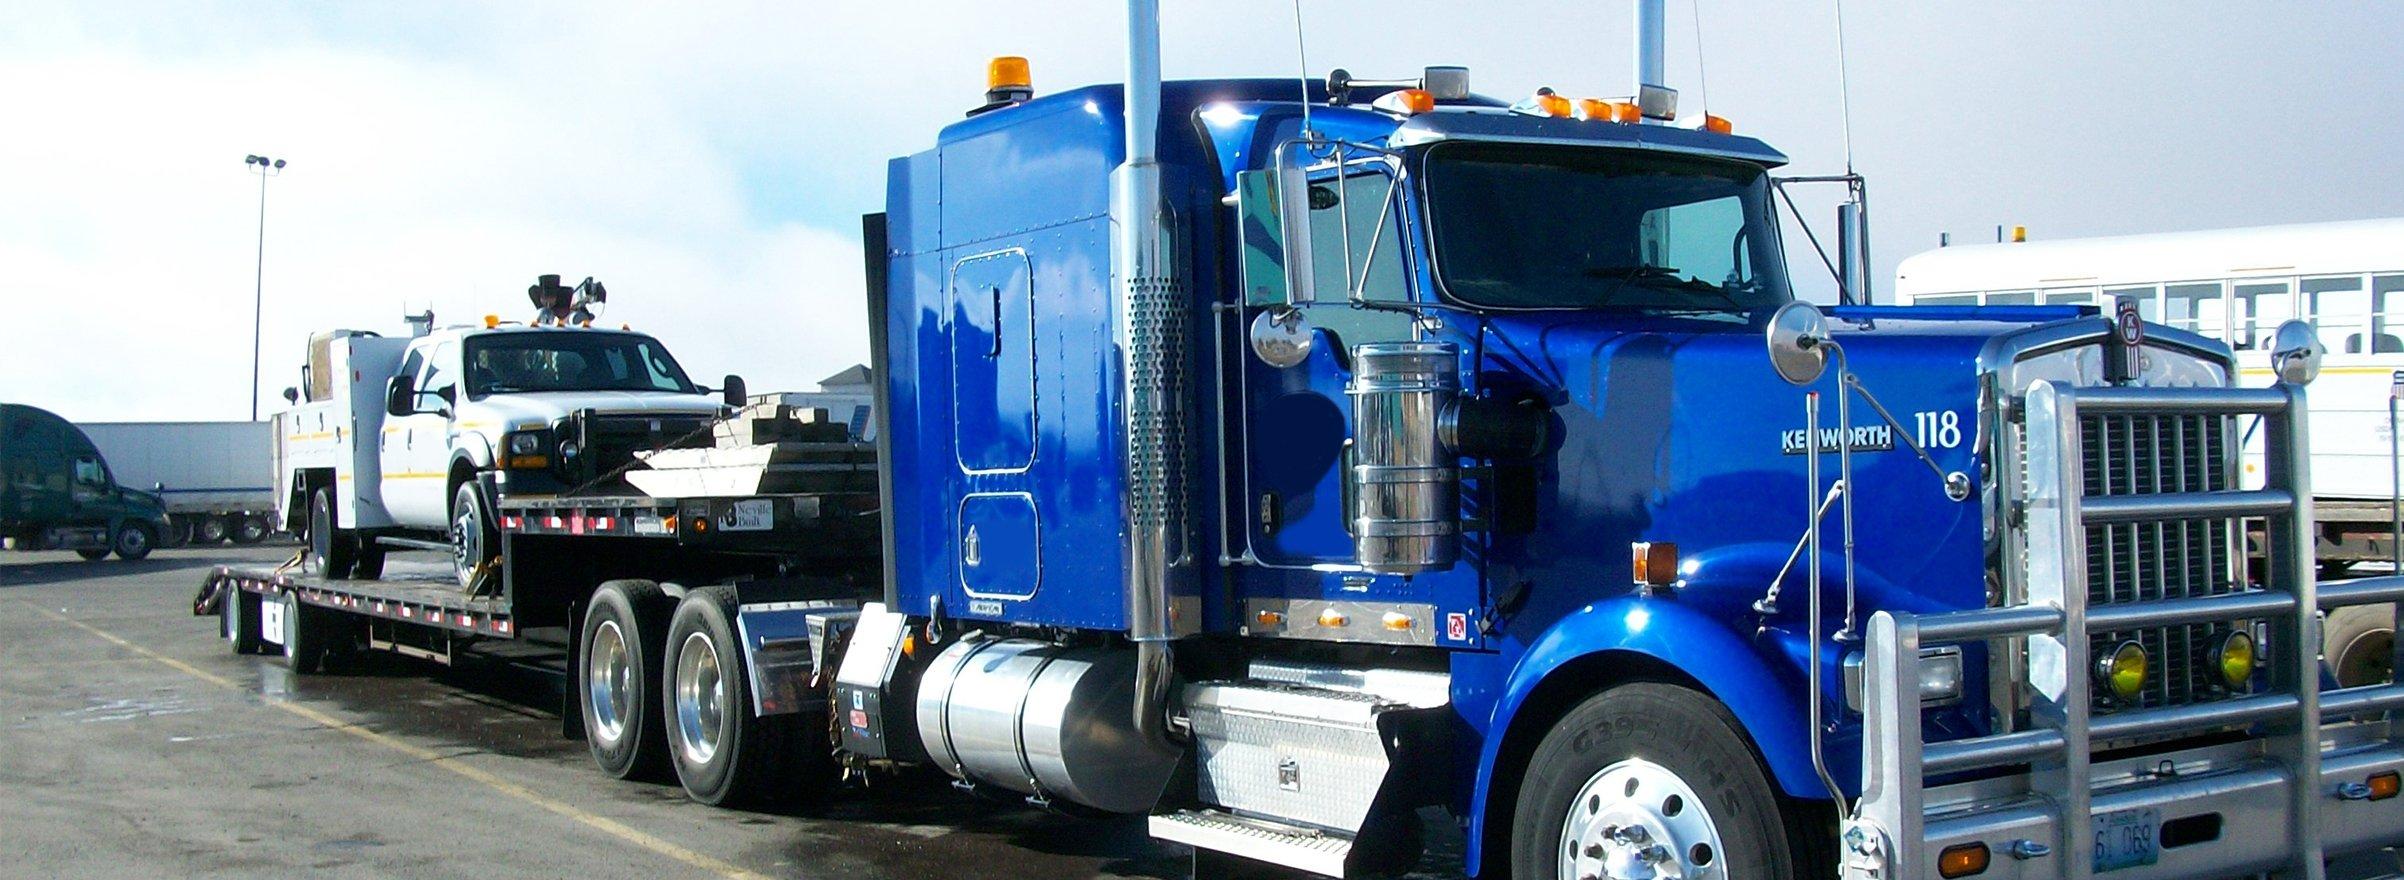 Blue semi hauling a broke down electrical truck